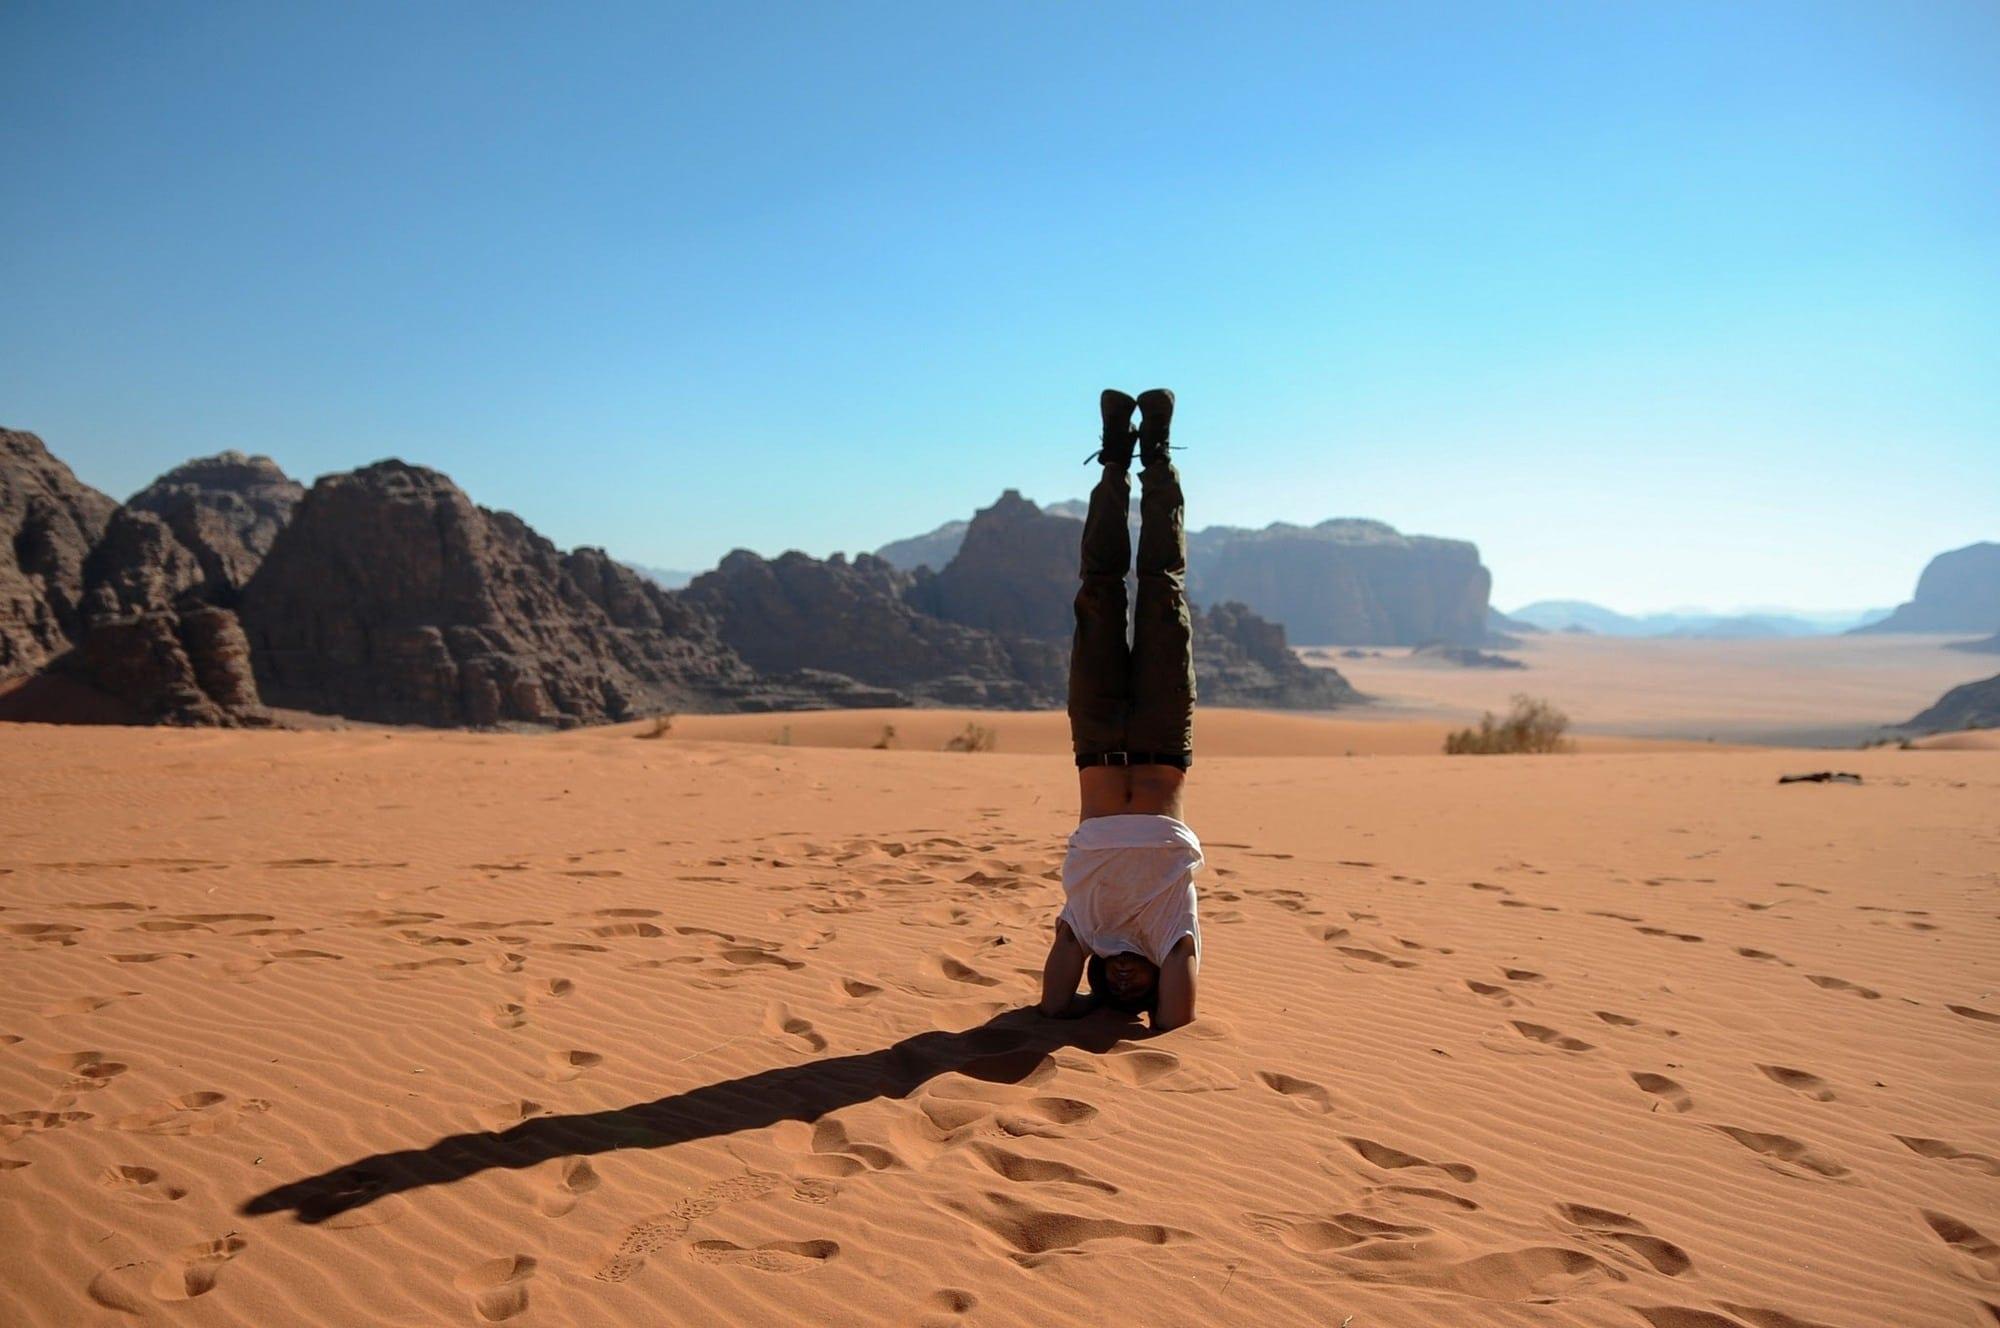 Wadi Rum - ואדי ראם ירדן - ערוצים בטבע